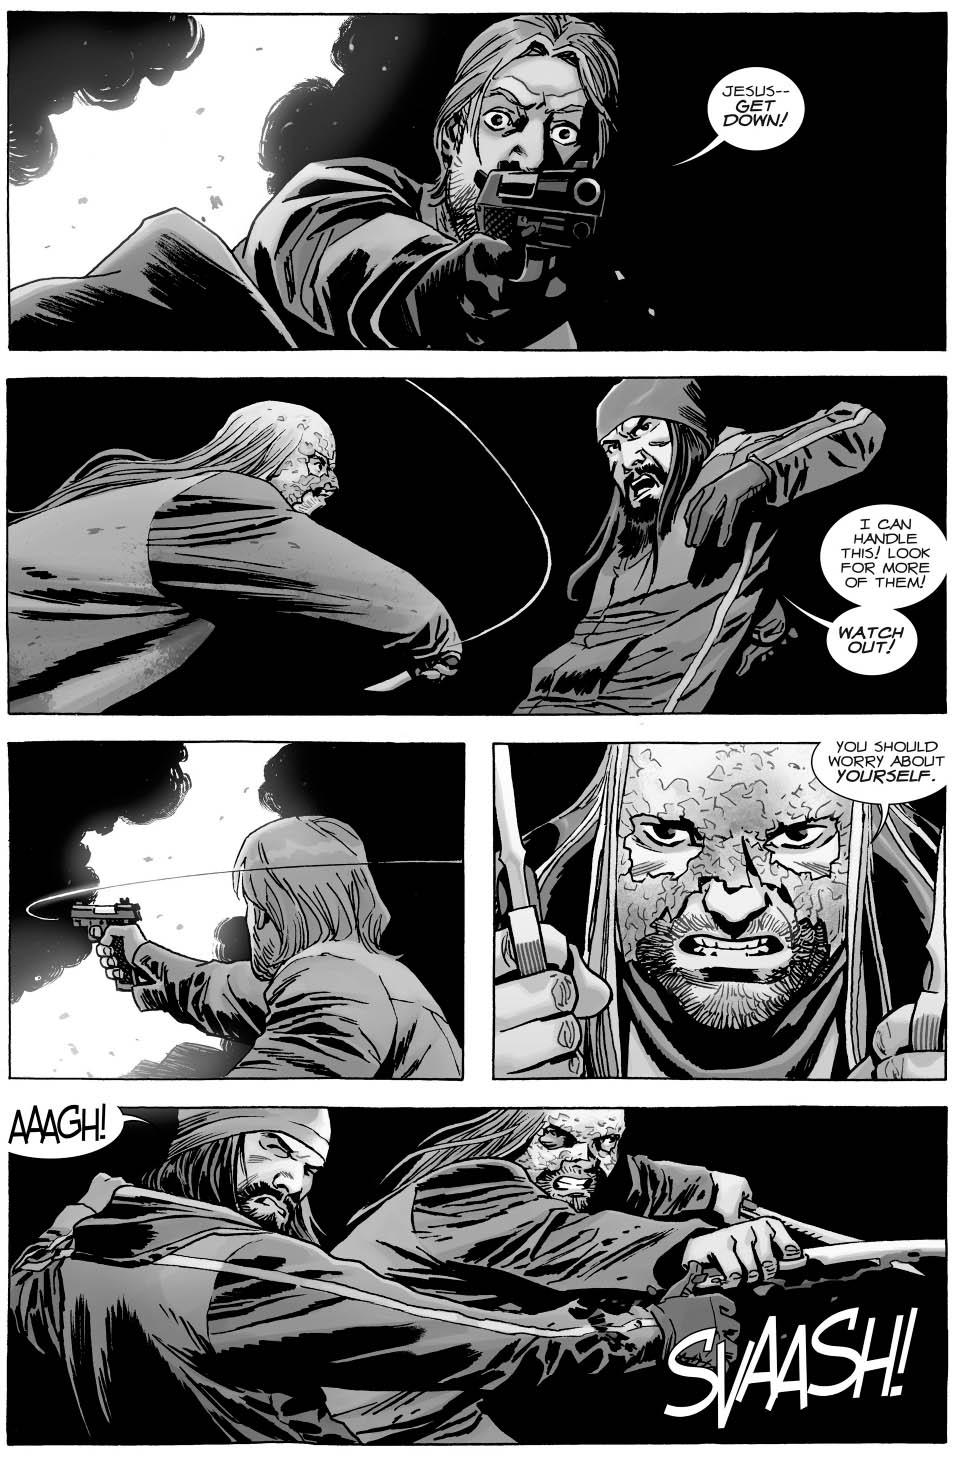 Jesus VS Beta (The Walking Dead)